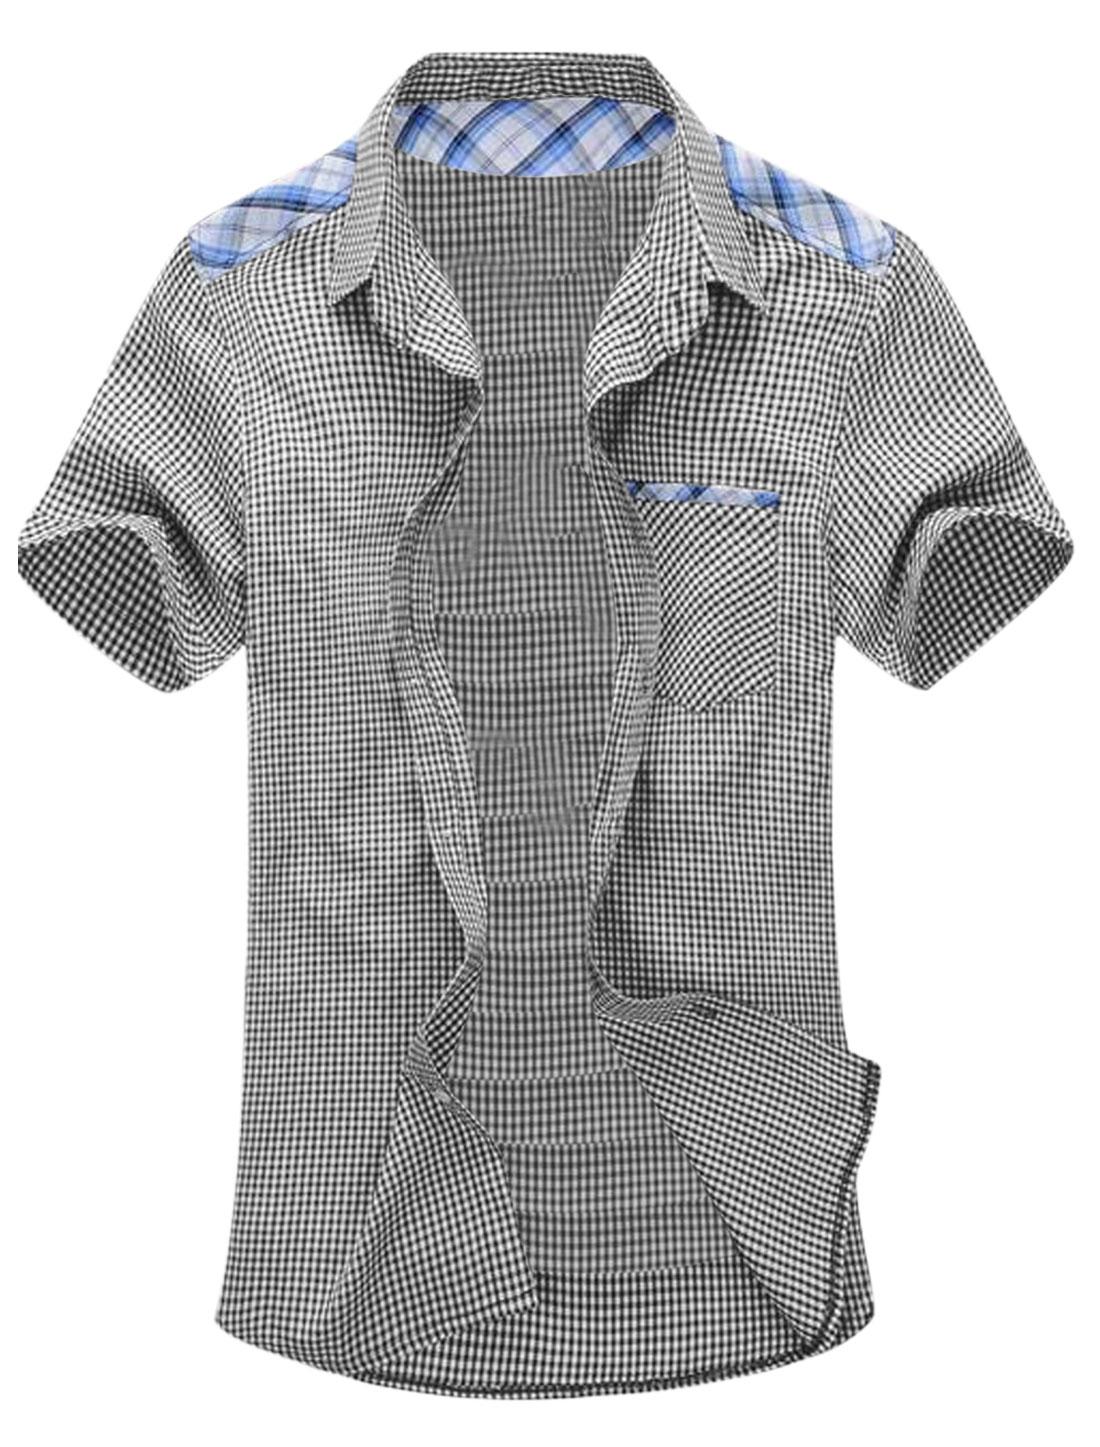 Man Plaids Point Collar Short Sleeves Single Breasted Panel Shirt Black White M